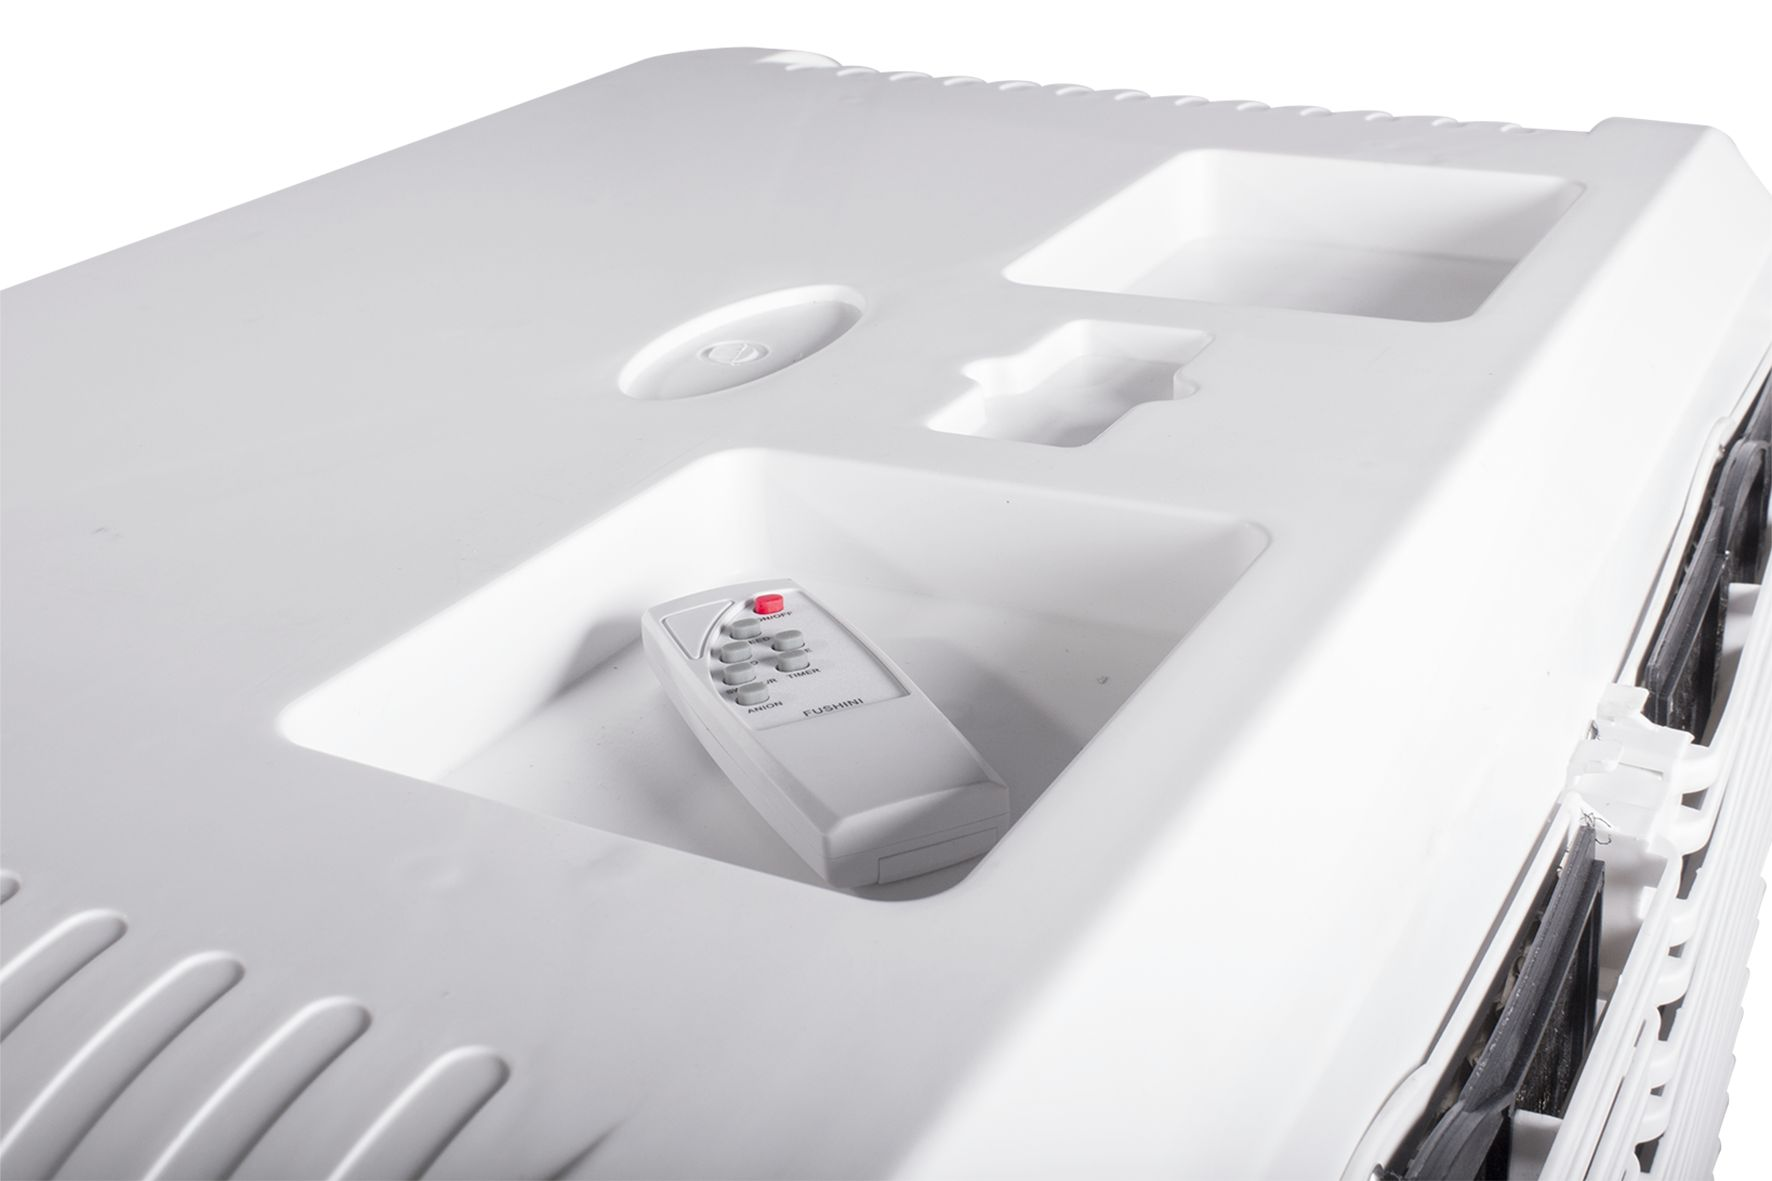 ventilateur rafra chisseur d 39 air pro 6000 m h. Black Bedroom Furniture Sets. Home Design Ideas